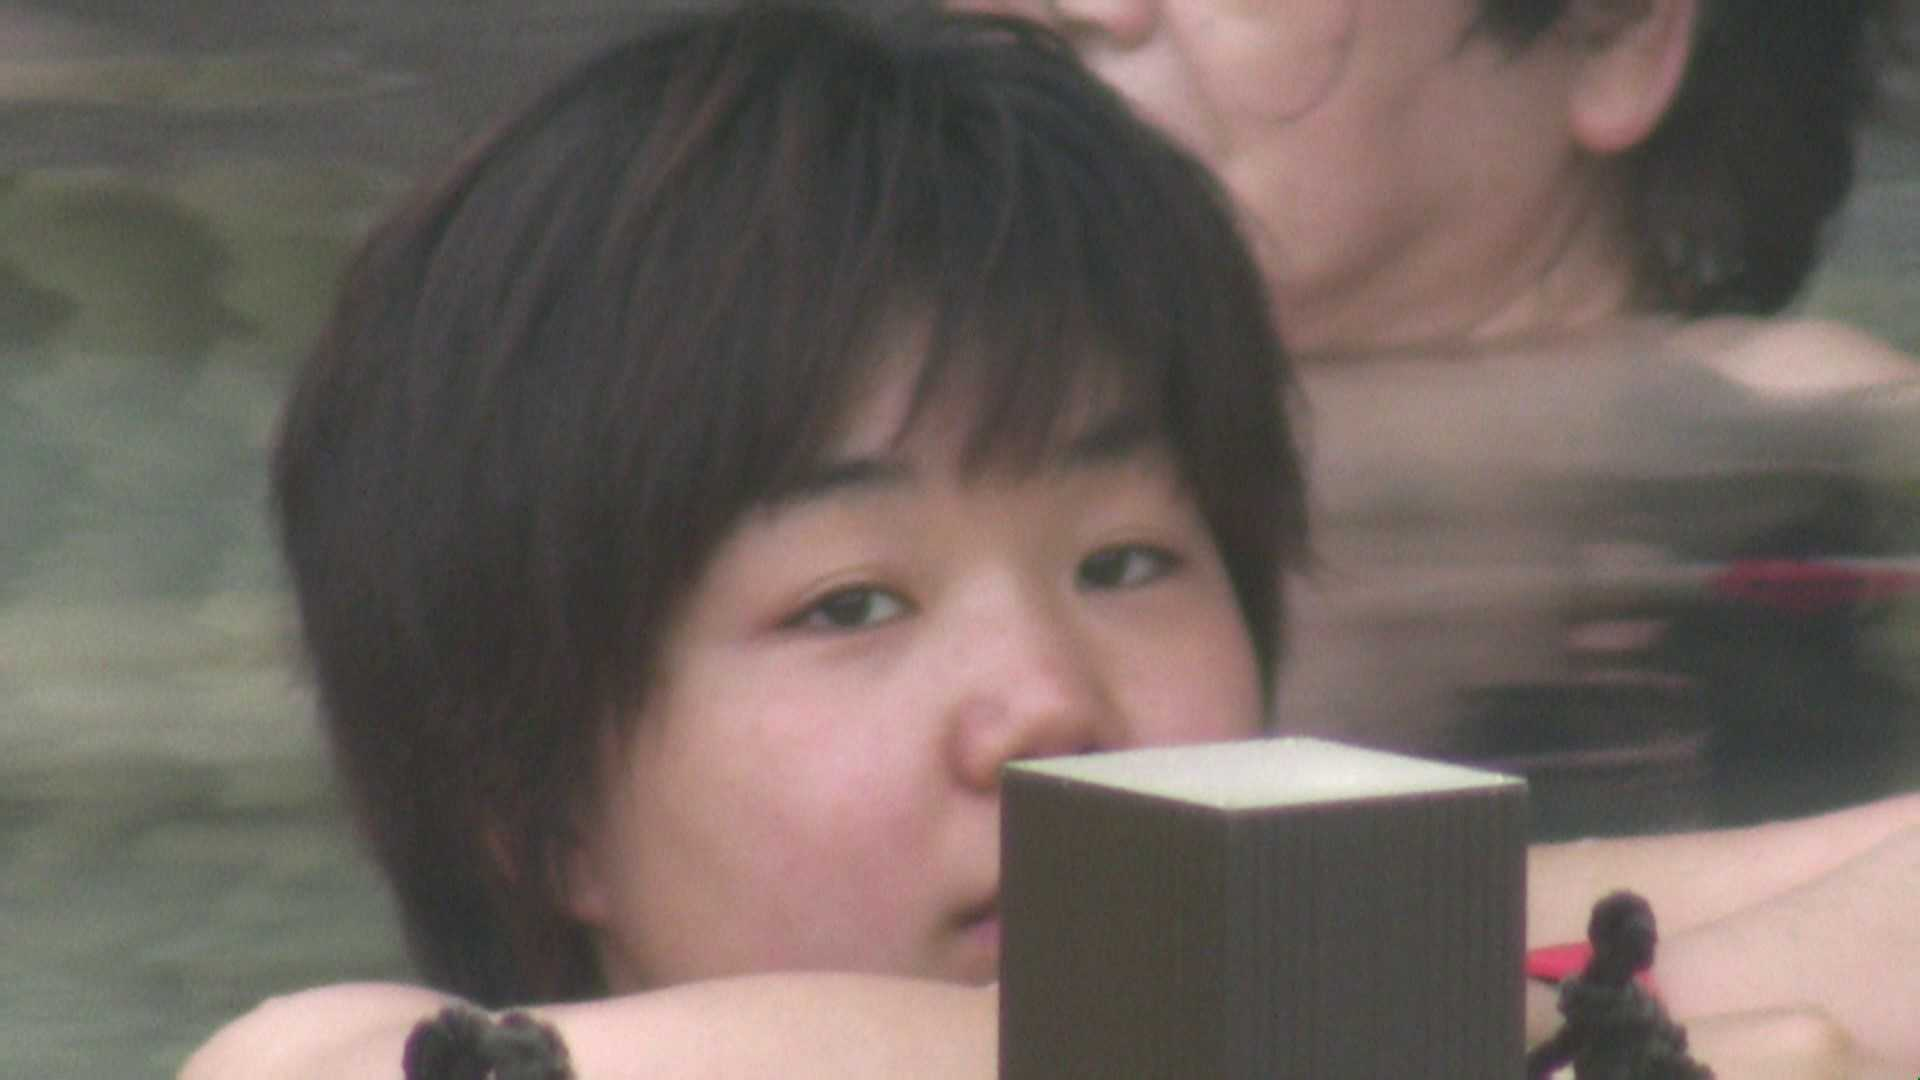 Aquaな露天風呂Vol.53【VIP限定】 露天風呂編   盗撮シリーズ  76PIX 29